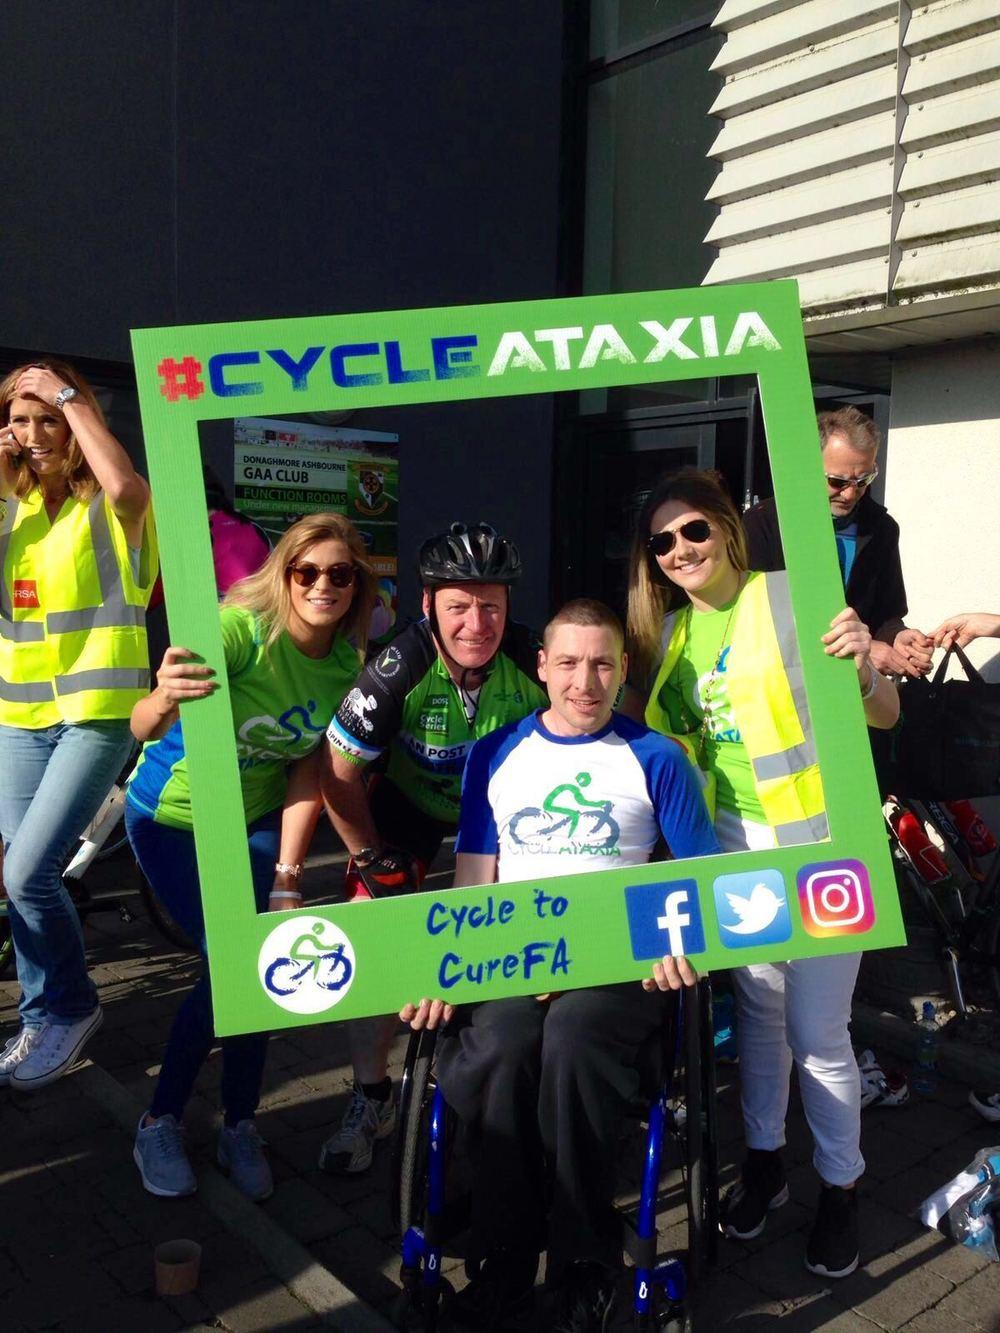 Cycle Ataxia Venue (11).JPG